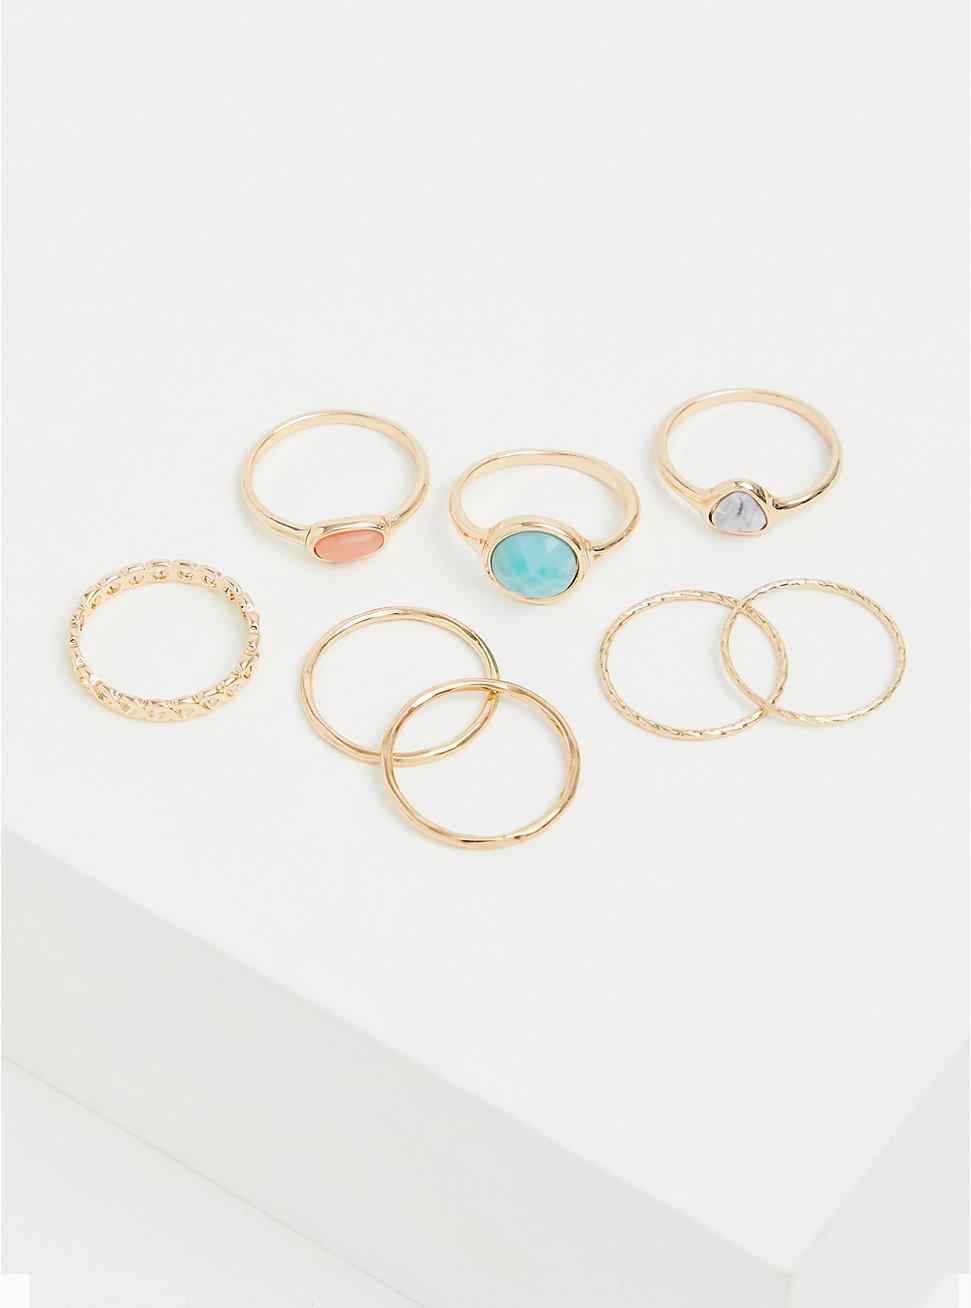 Gold-Tone Faux Aqua Stone Ring Set - Set of 8, TURQUOISE, hi-res